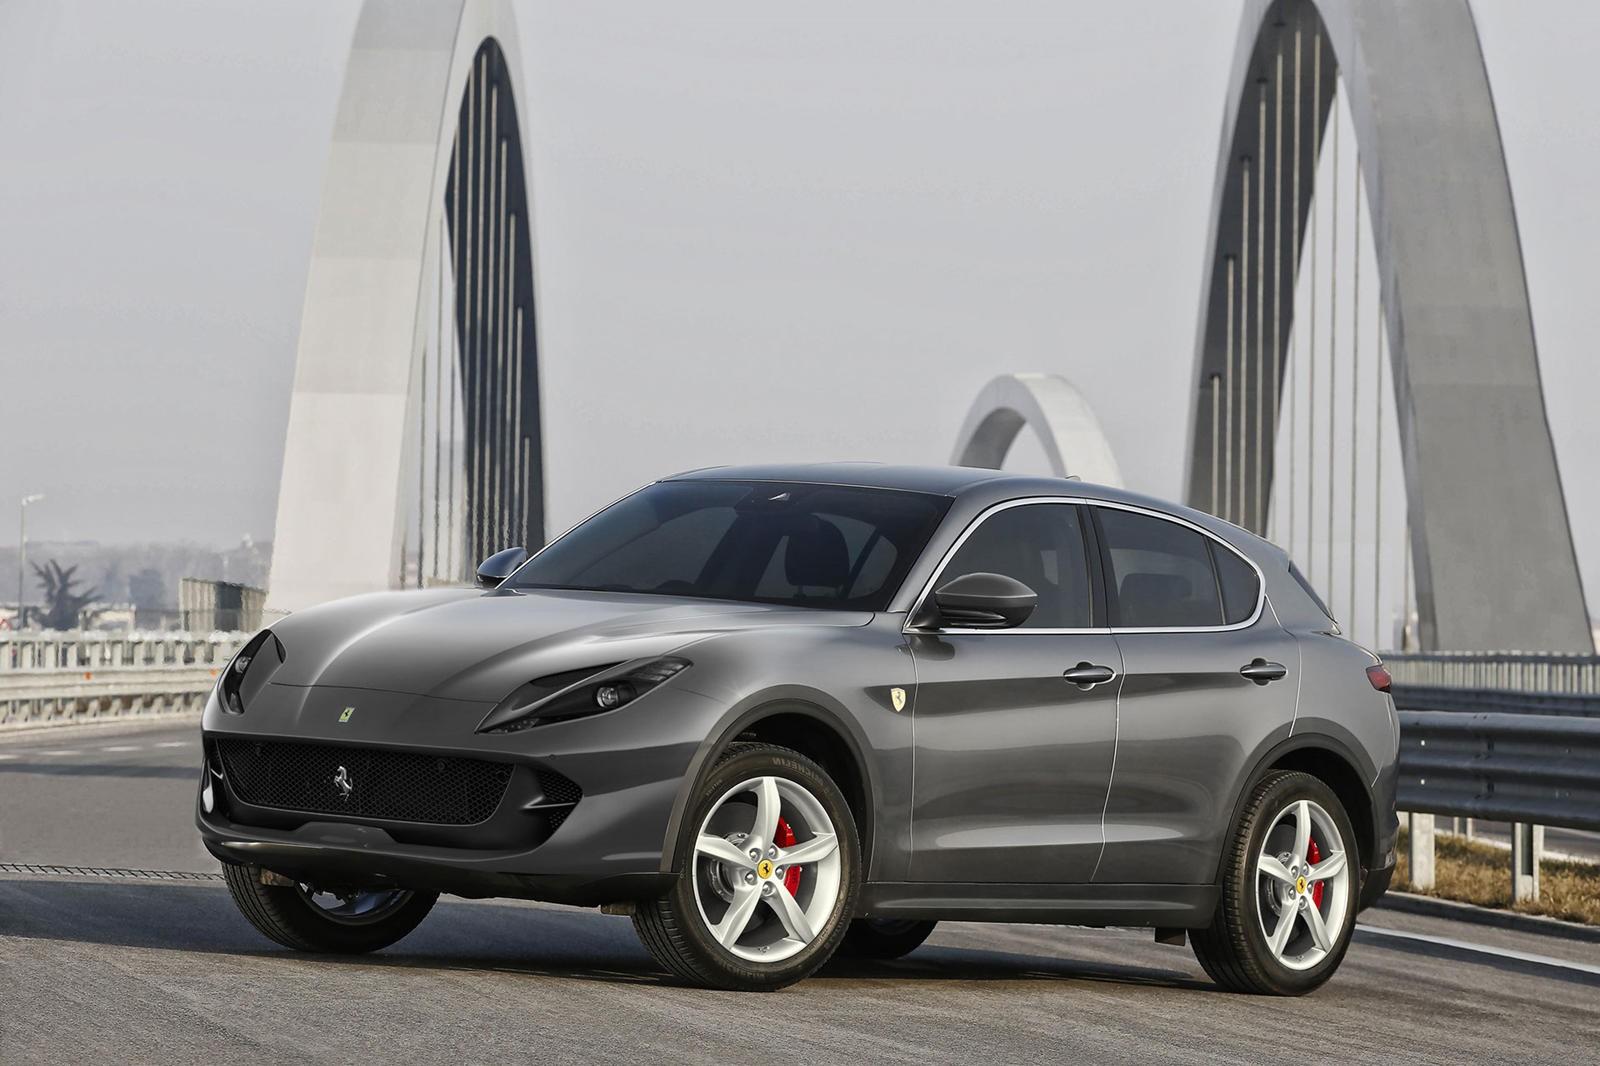 Siêu SUV Ferrari Purosangue hé lộ thông số đấu Lamborghini Urus